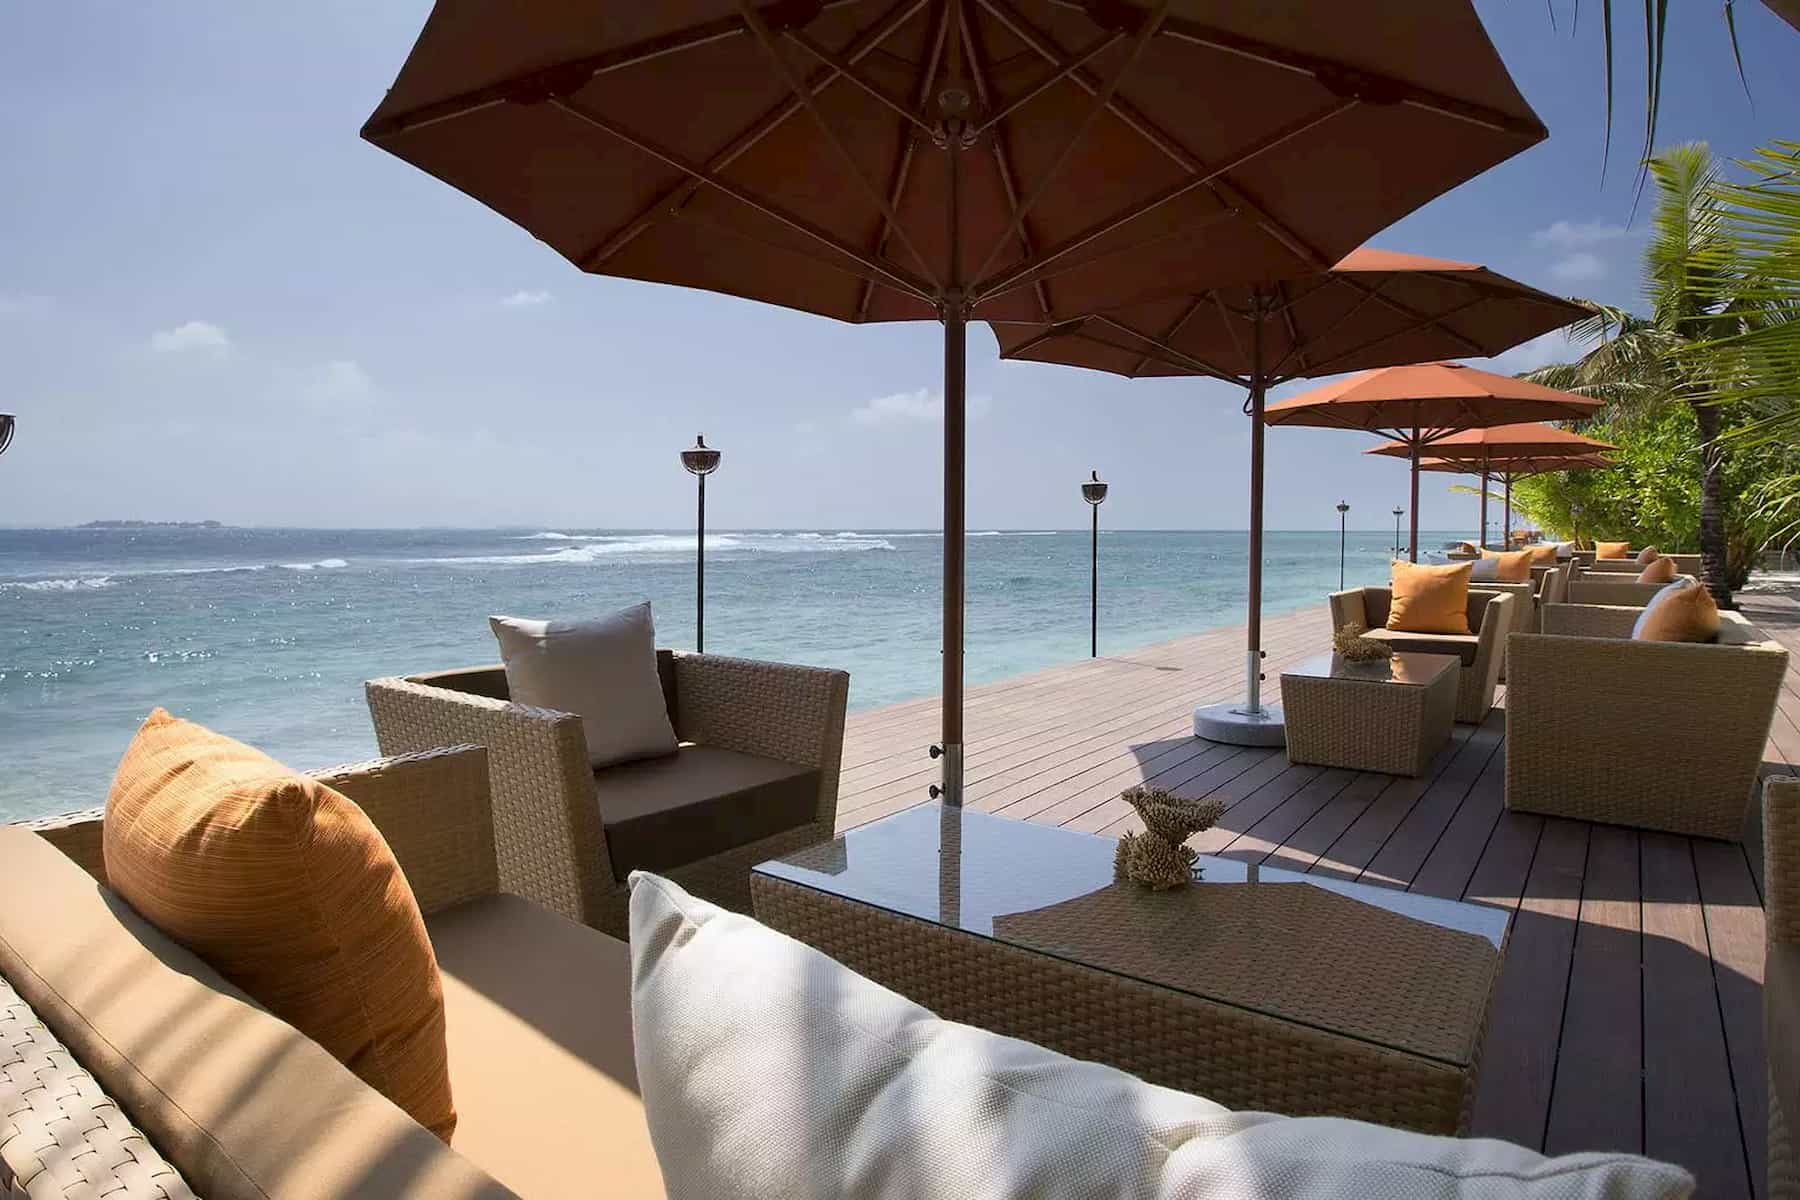 Anantara Dhigu resort Maldive 73 Degrees cucina internazionale